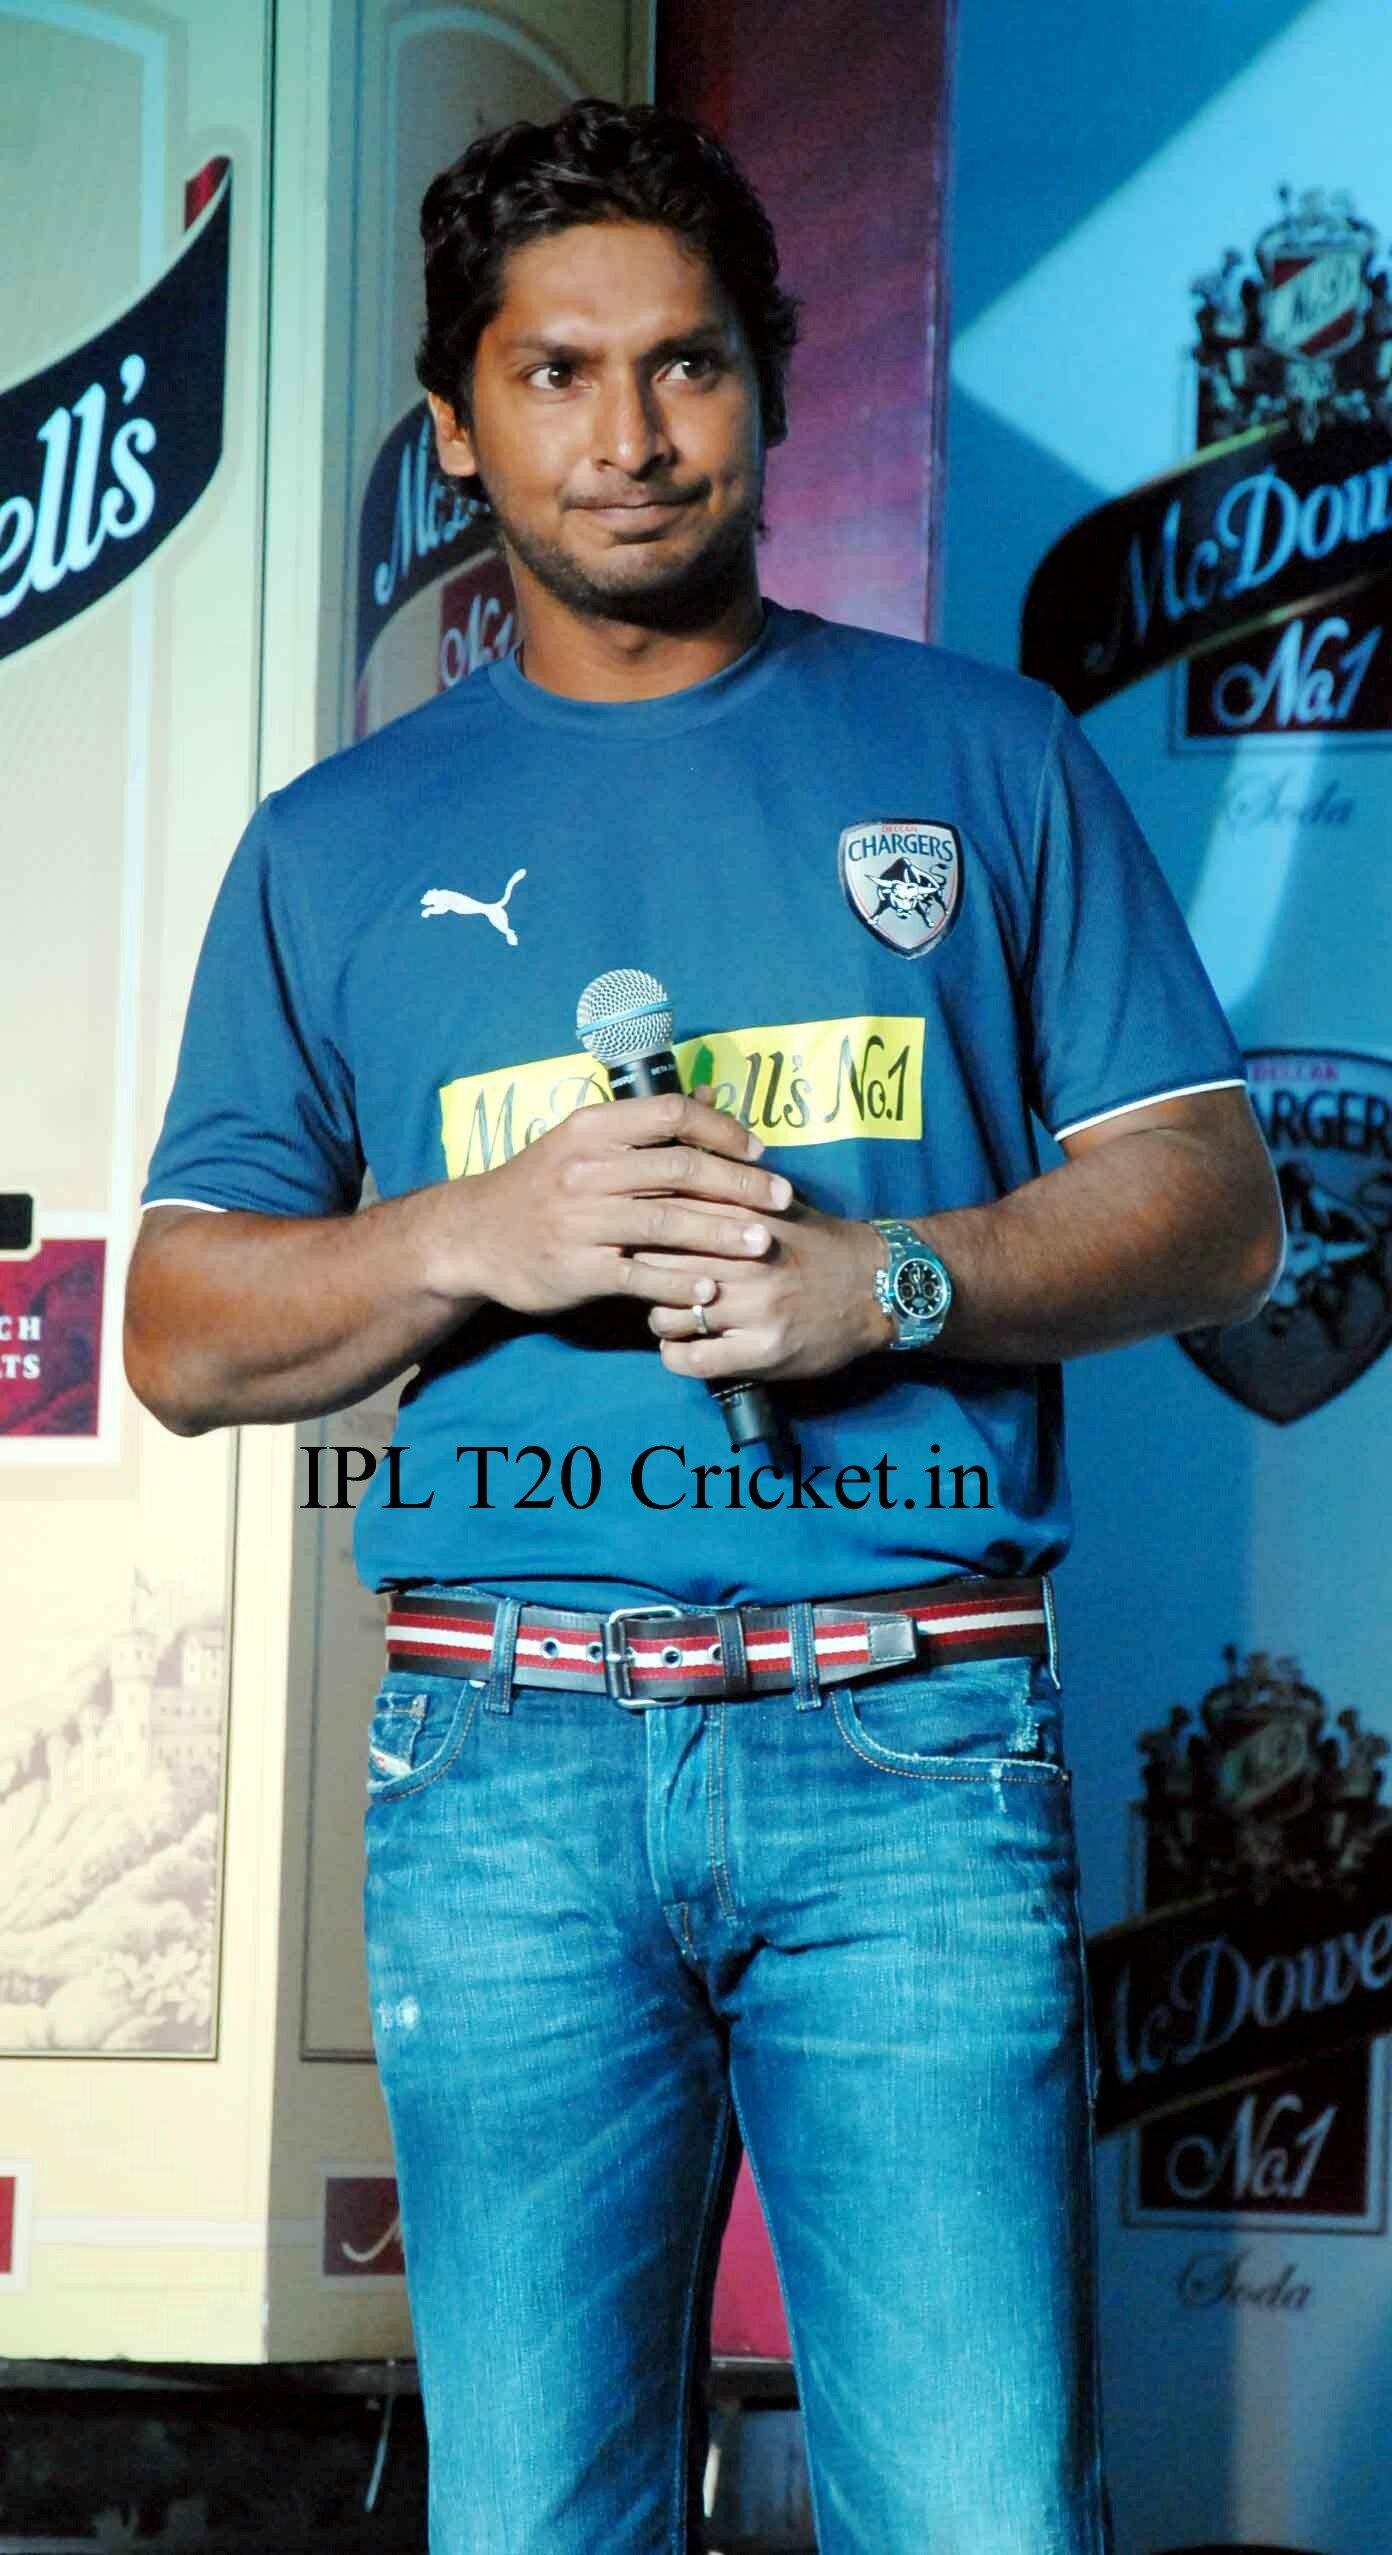 Deccan chargers captain Kumara Sangakkara